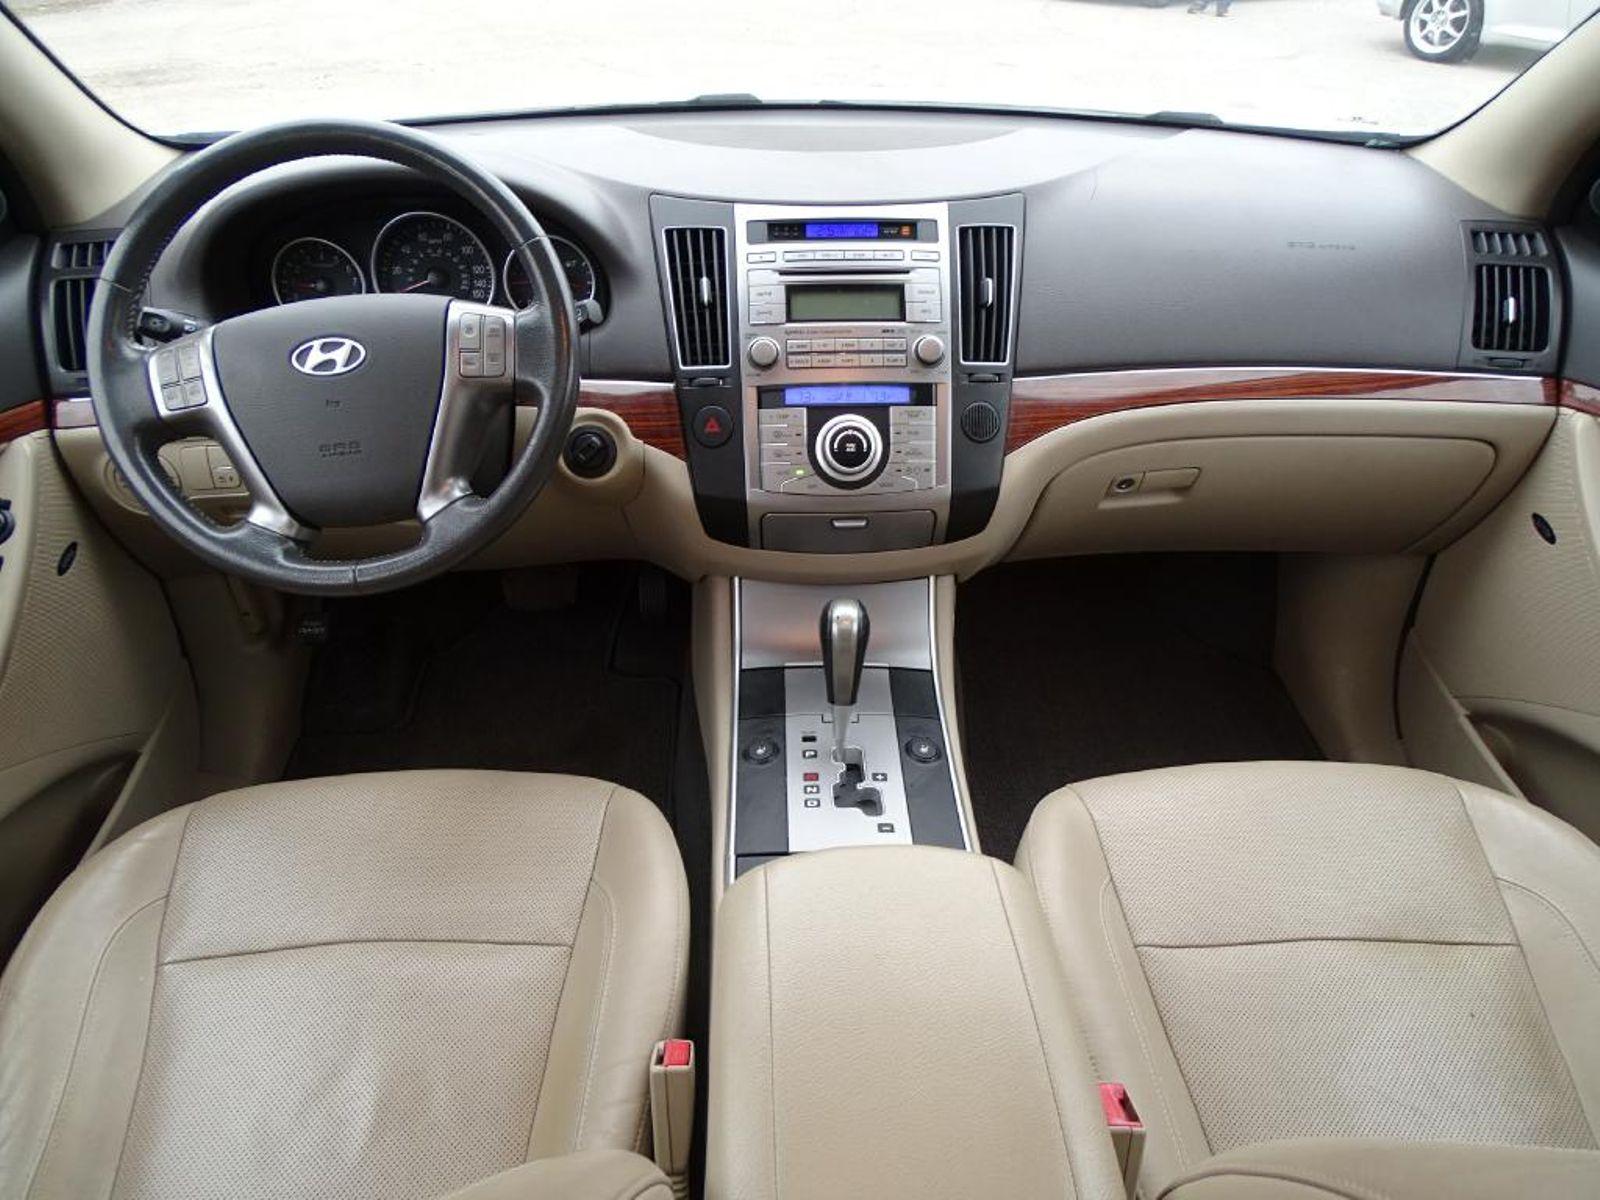 dealer gmc bluebonnet car yukon suv denali hyundai new in used certified braunfels austin